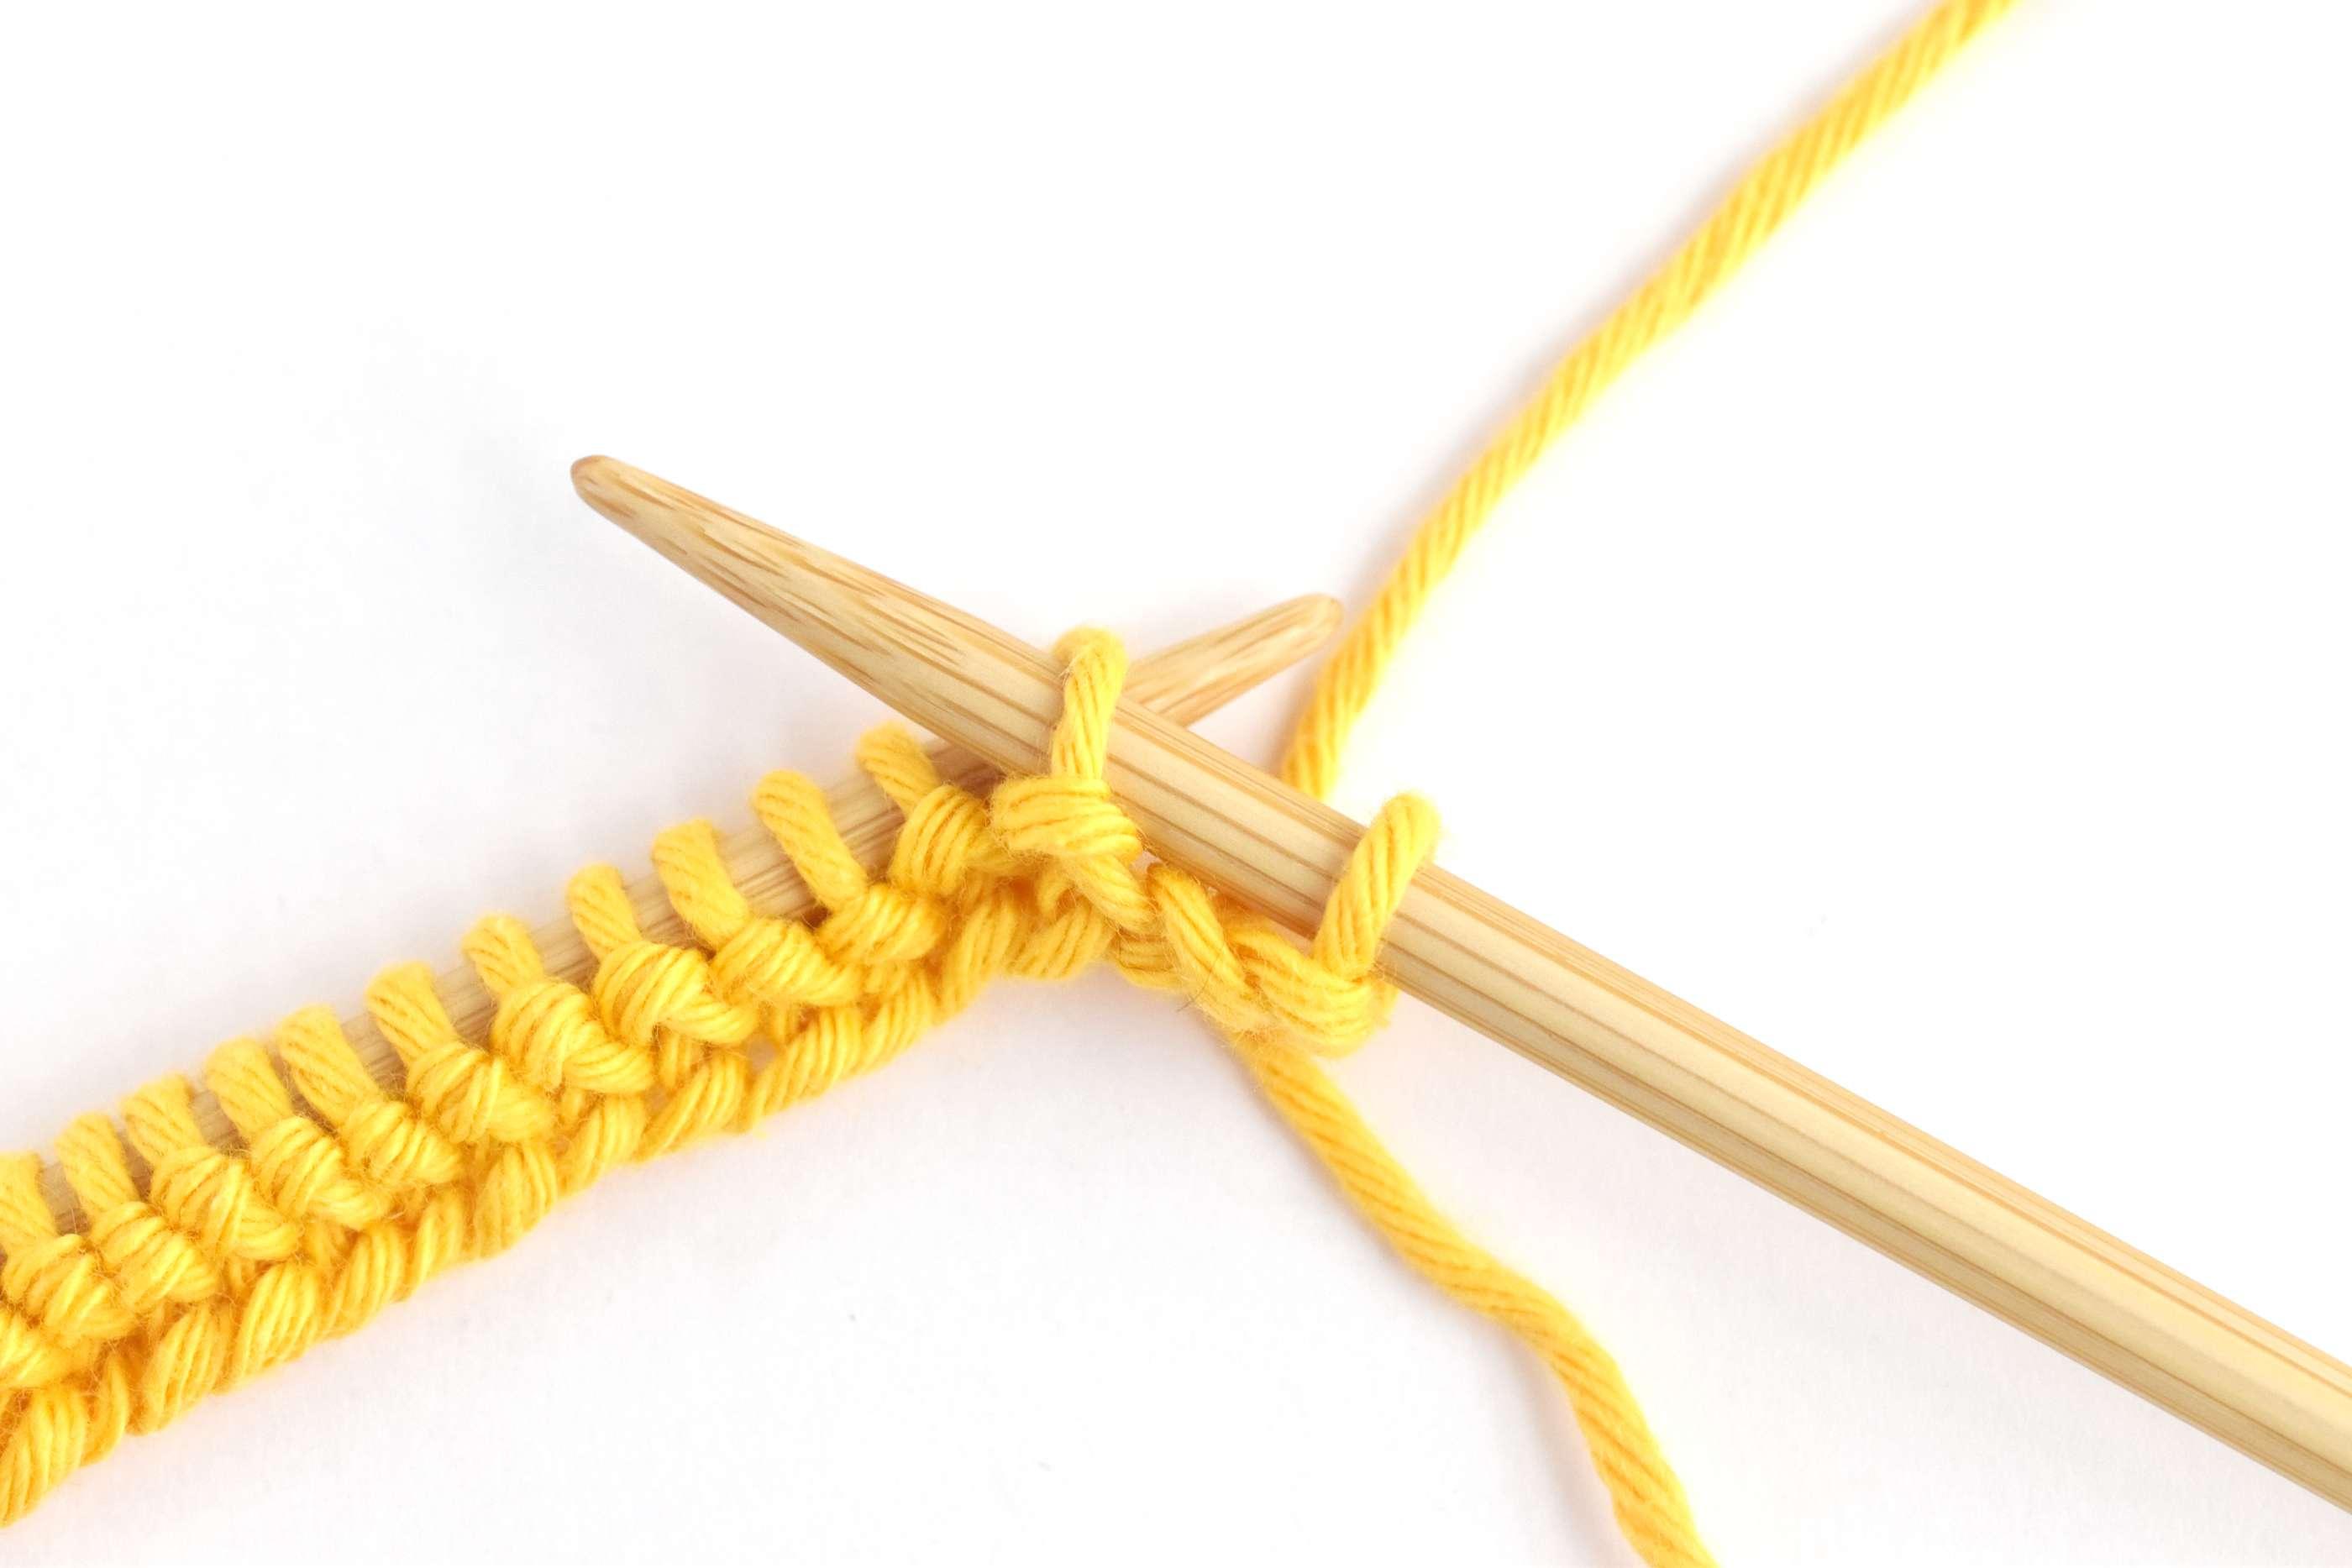 Honeycomb Stitch Row Two: Slipping a Stitch